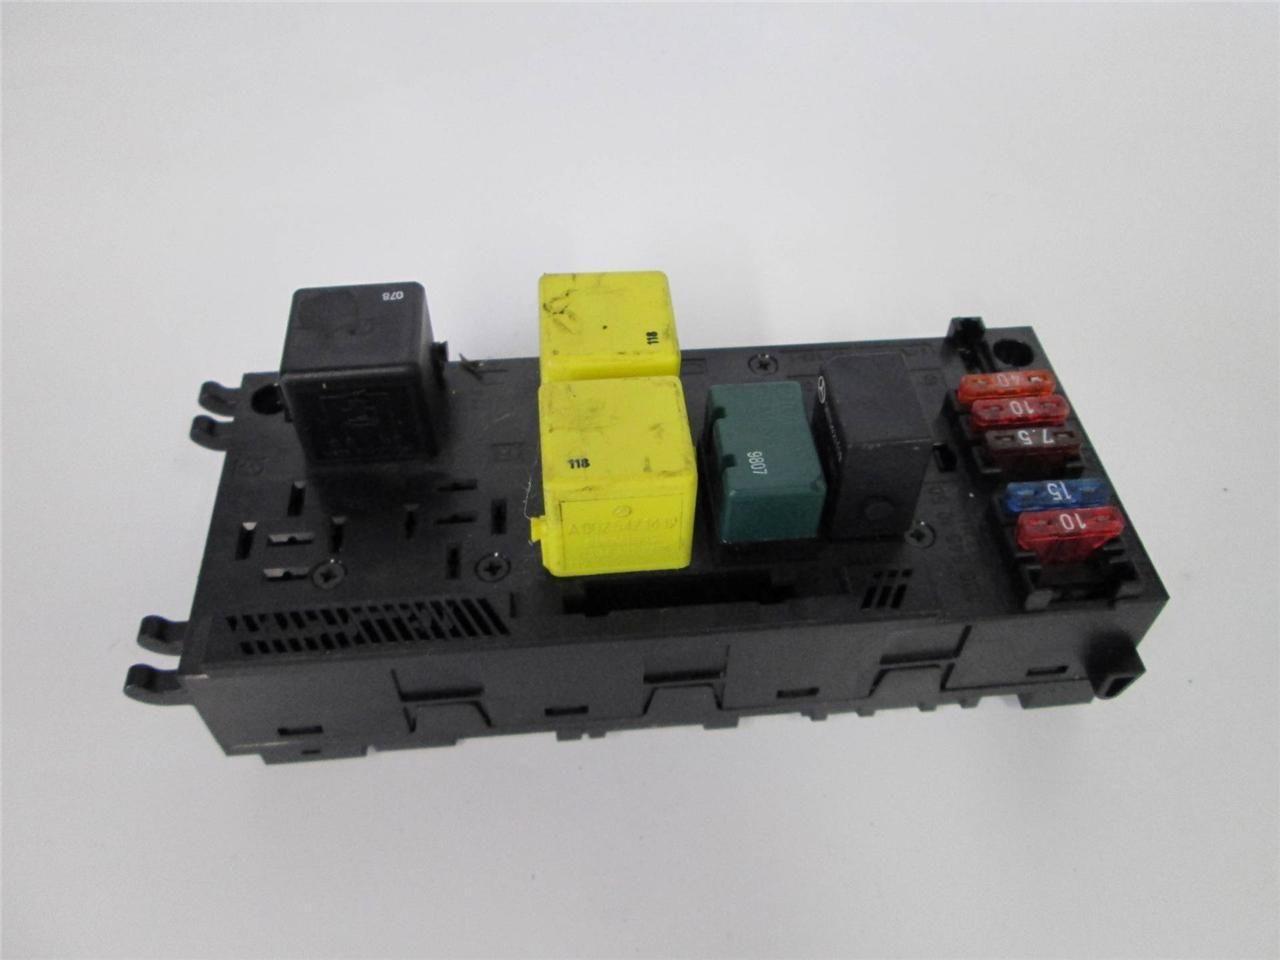 wiring harness sony mex bt3100p sony dsx